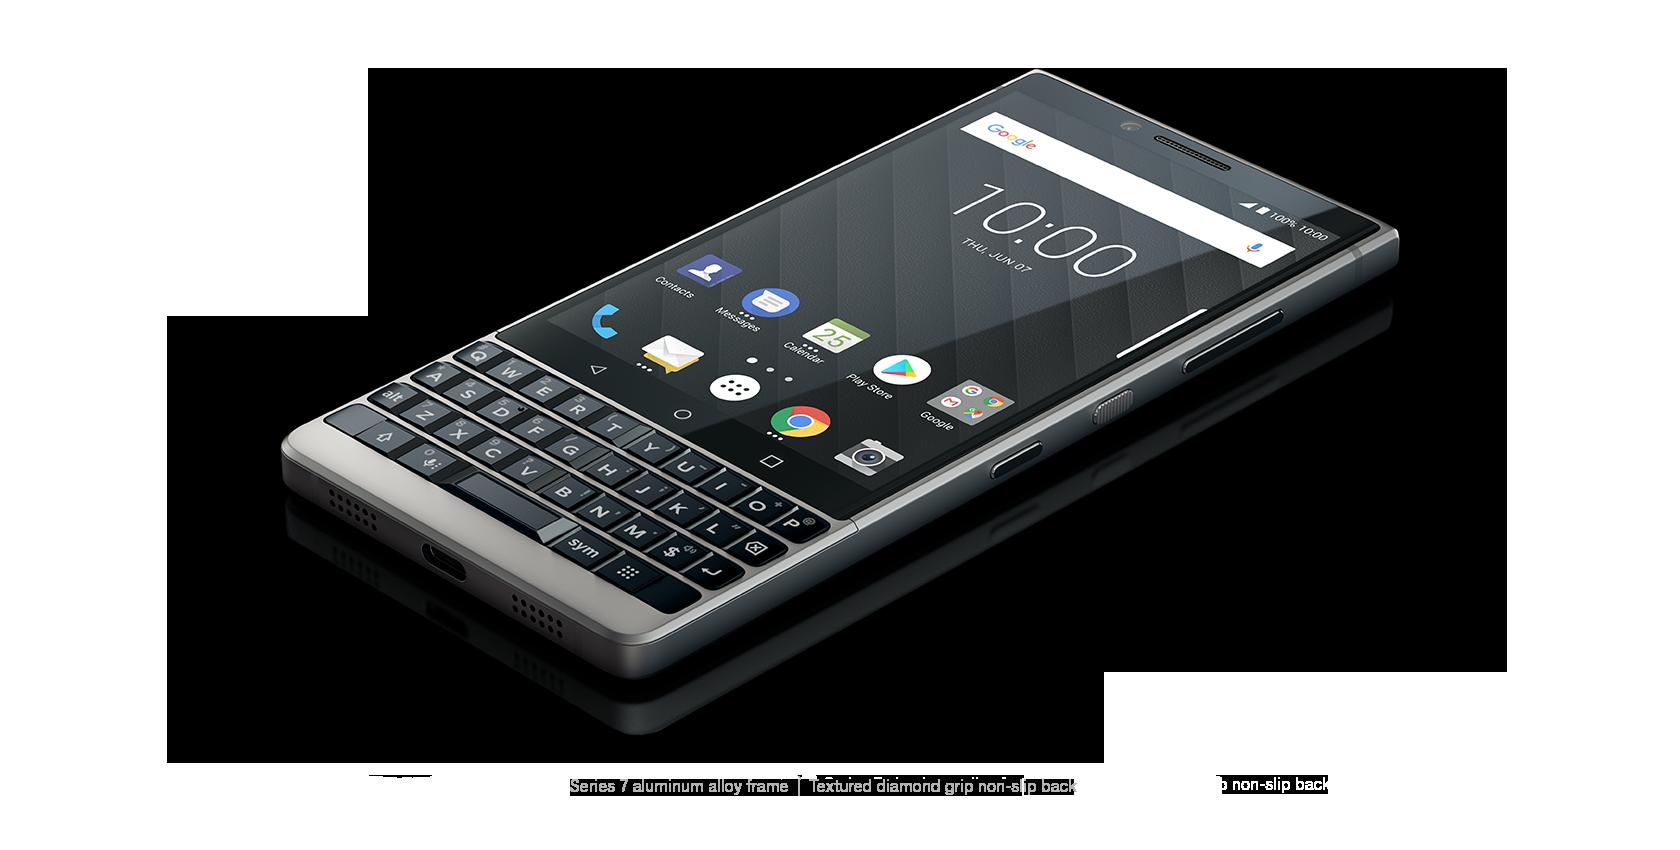 blackberry key2 front preview - BlackBerry KEY2